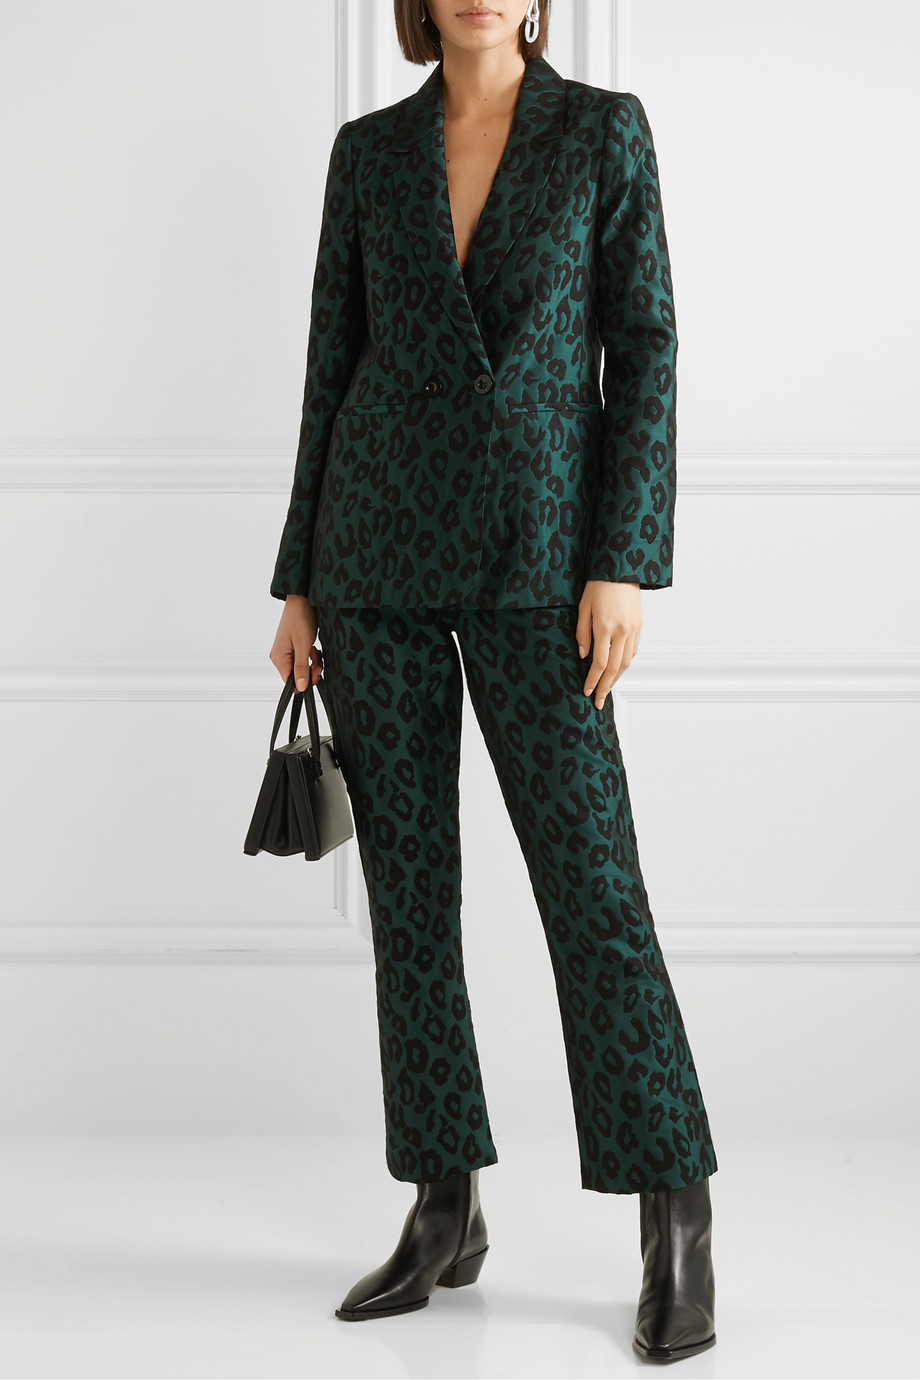 Anine Bing Madeleine 双排扣豹纹提花西装外套